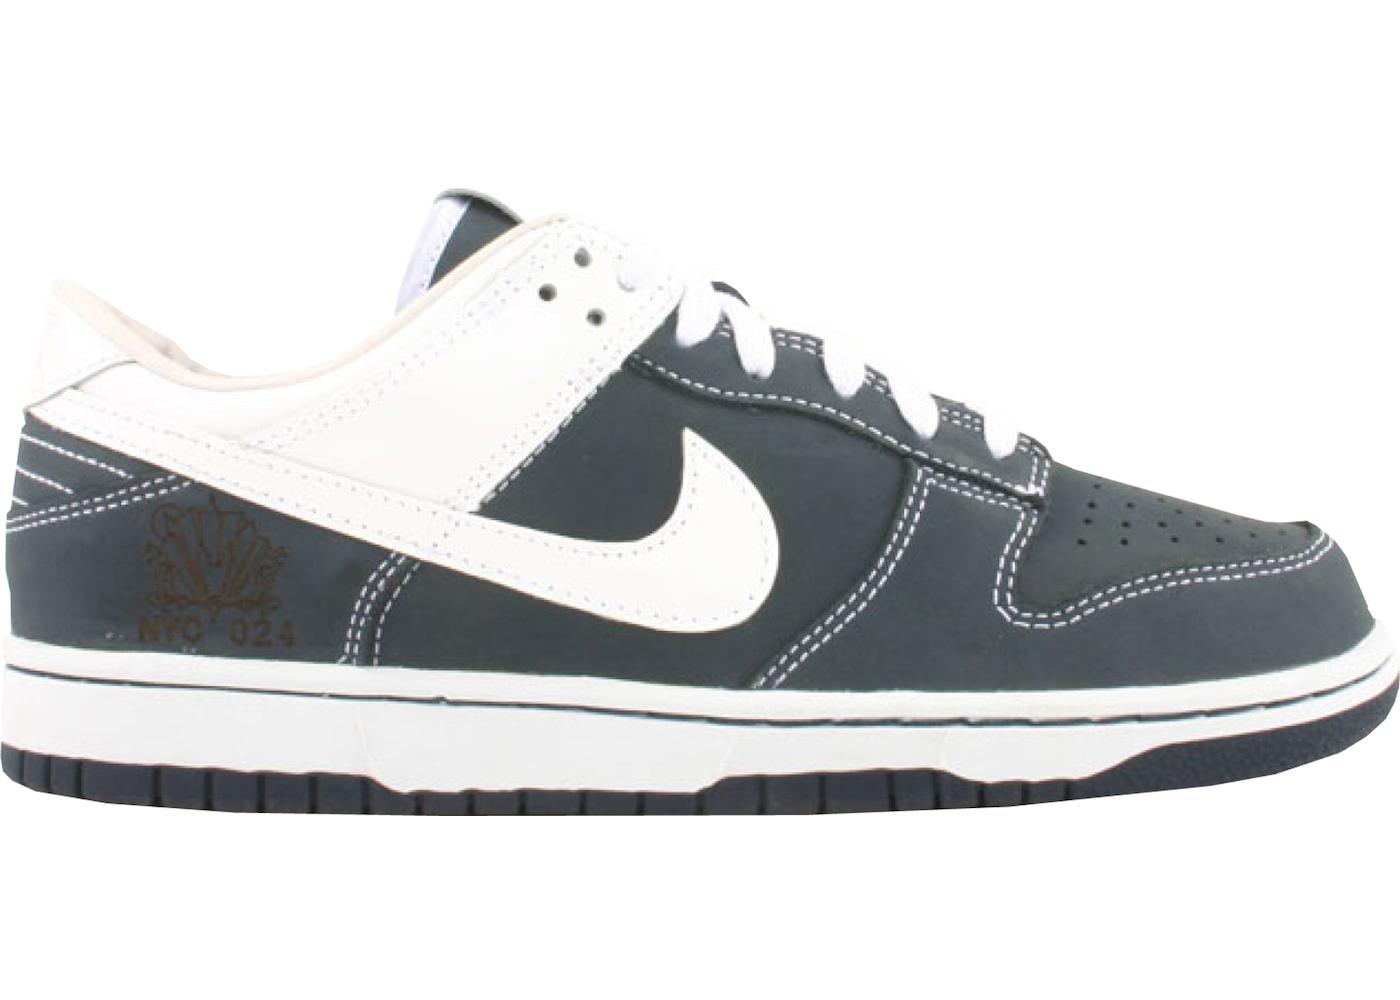 Nike Basketball Dunk Zapatos Precio Precio Precio Prima de84fa